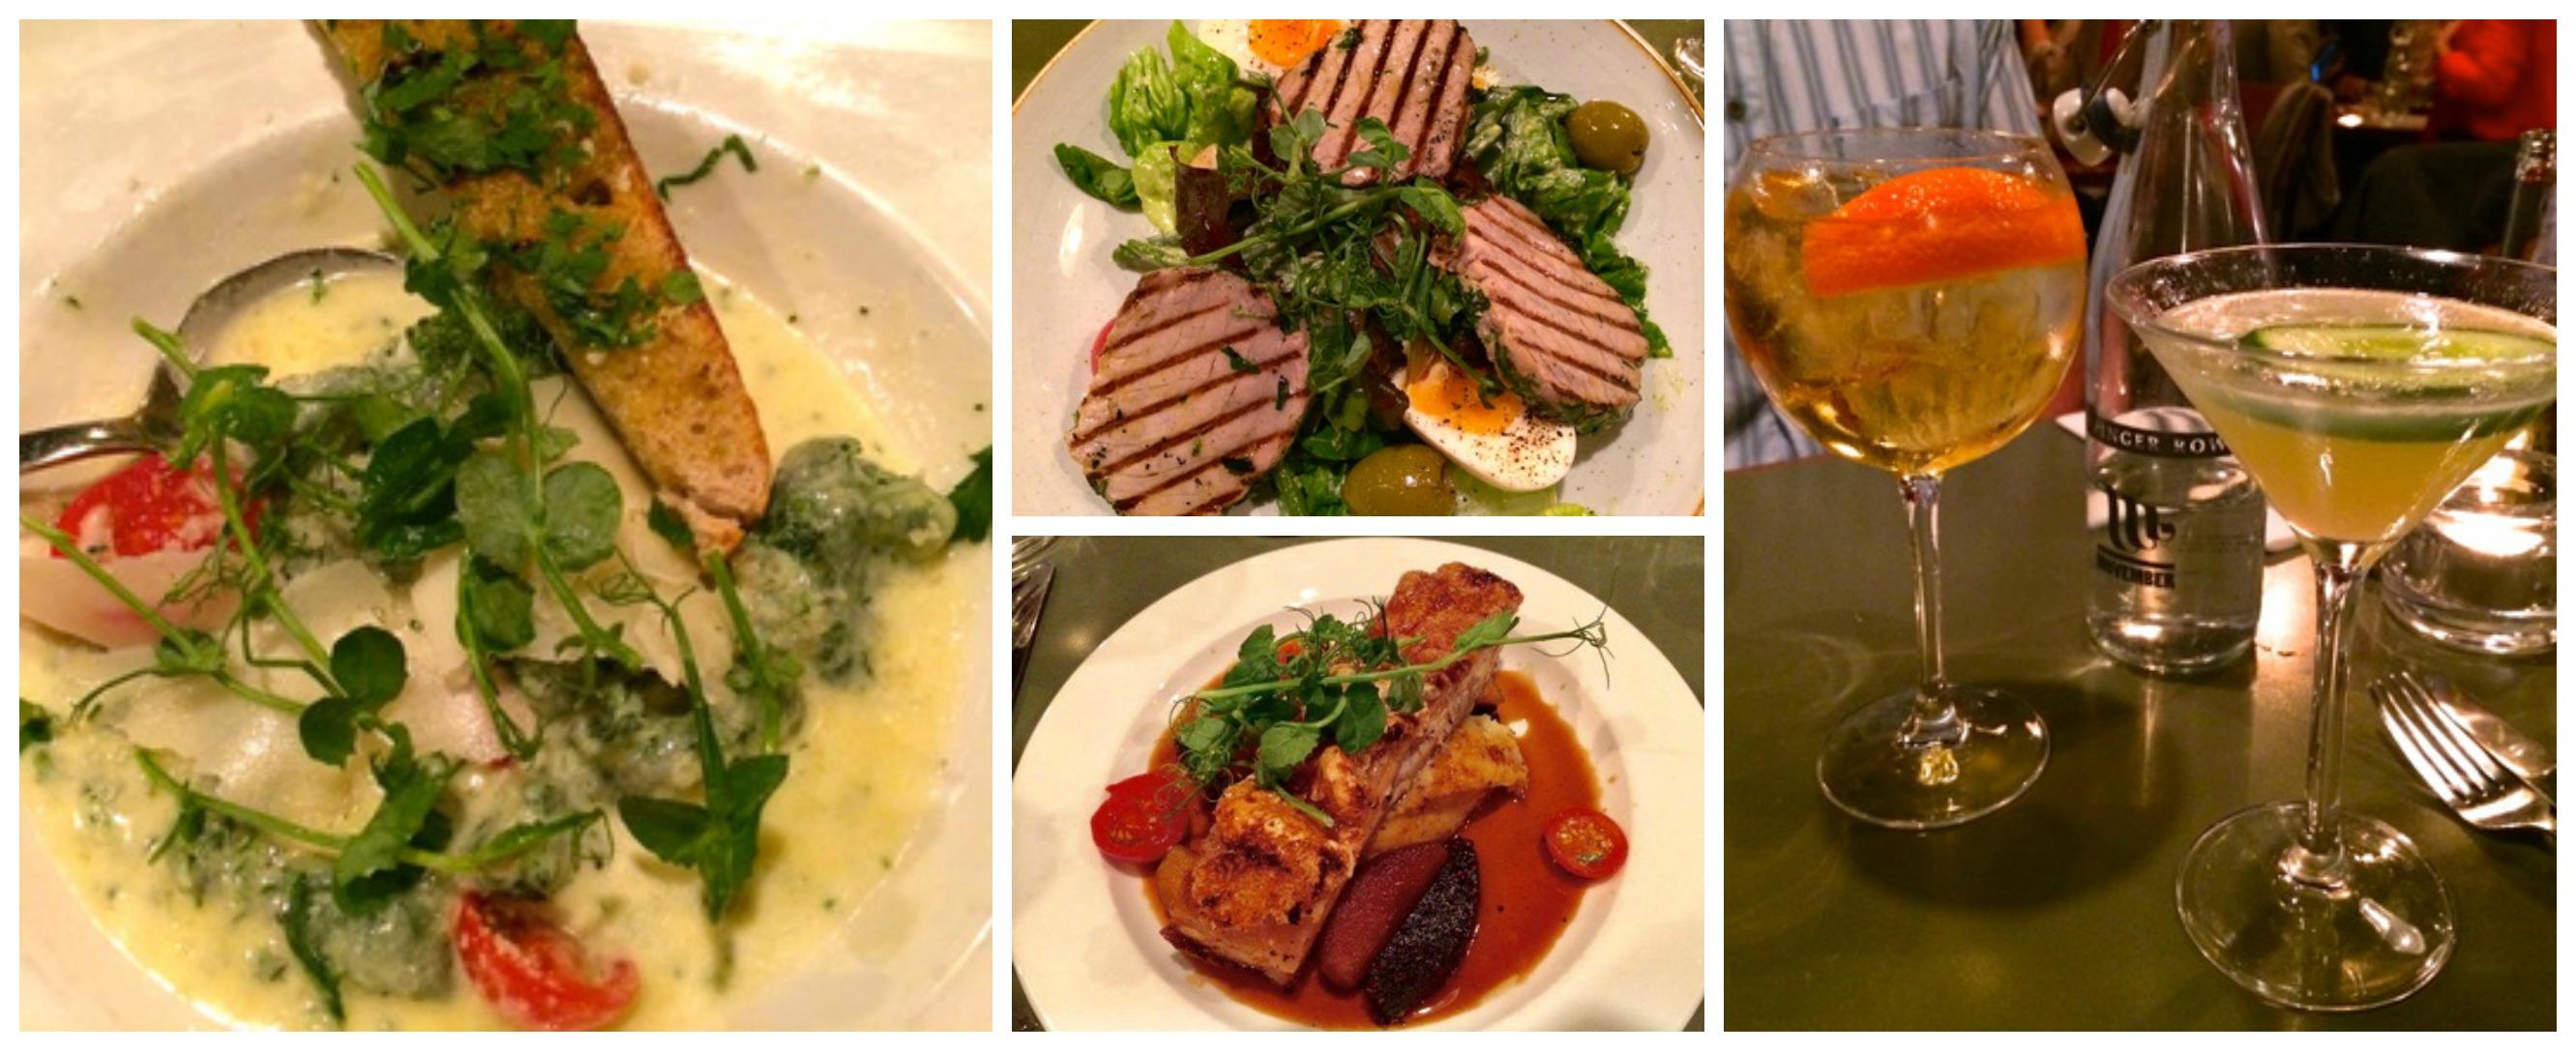 Our Five Favorite Restaurants in Ireland